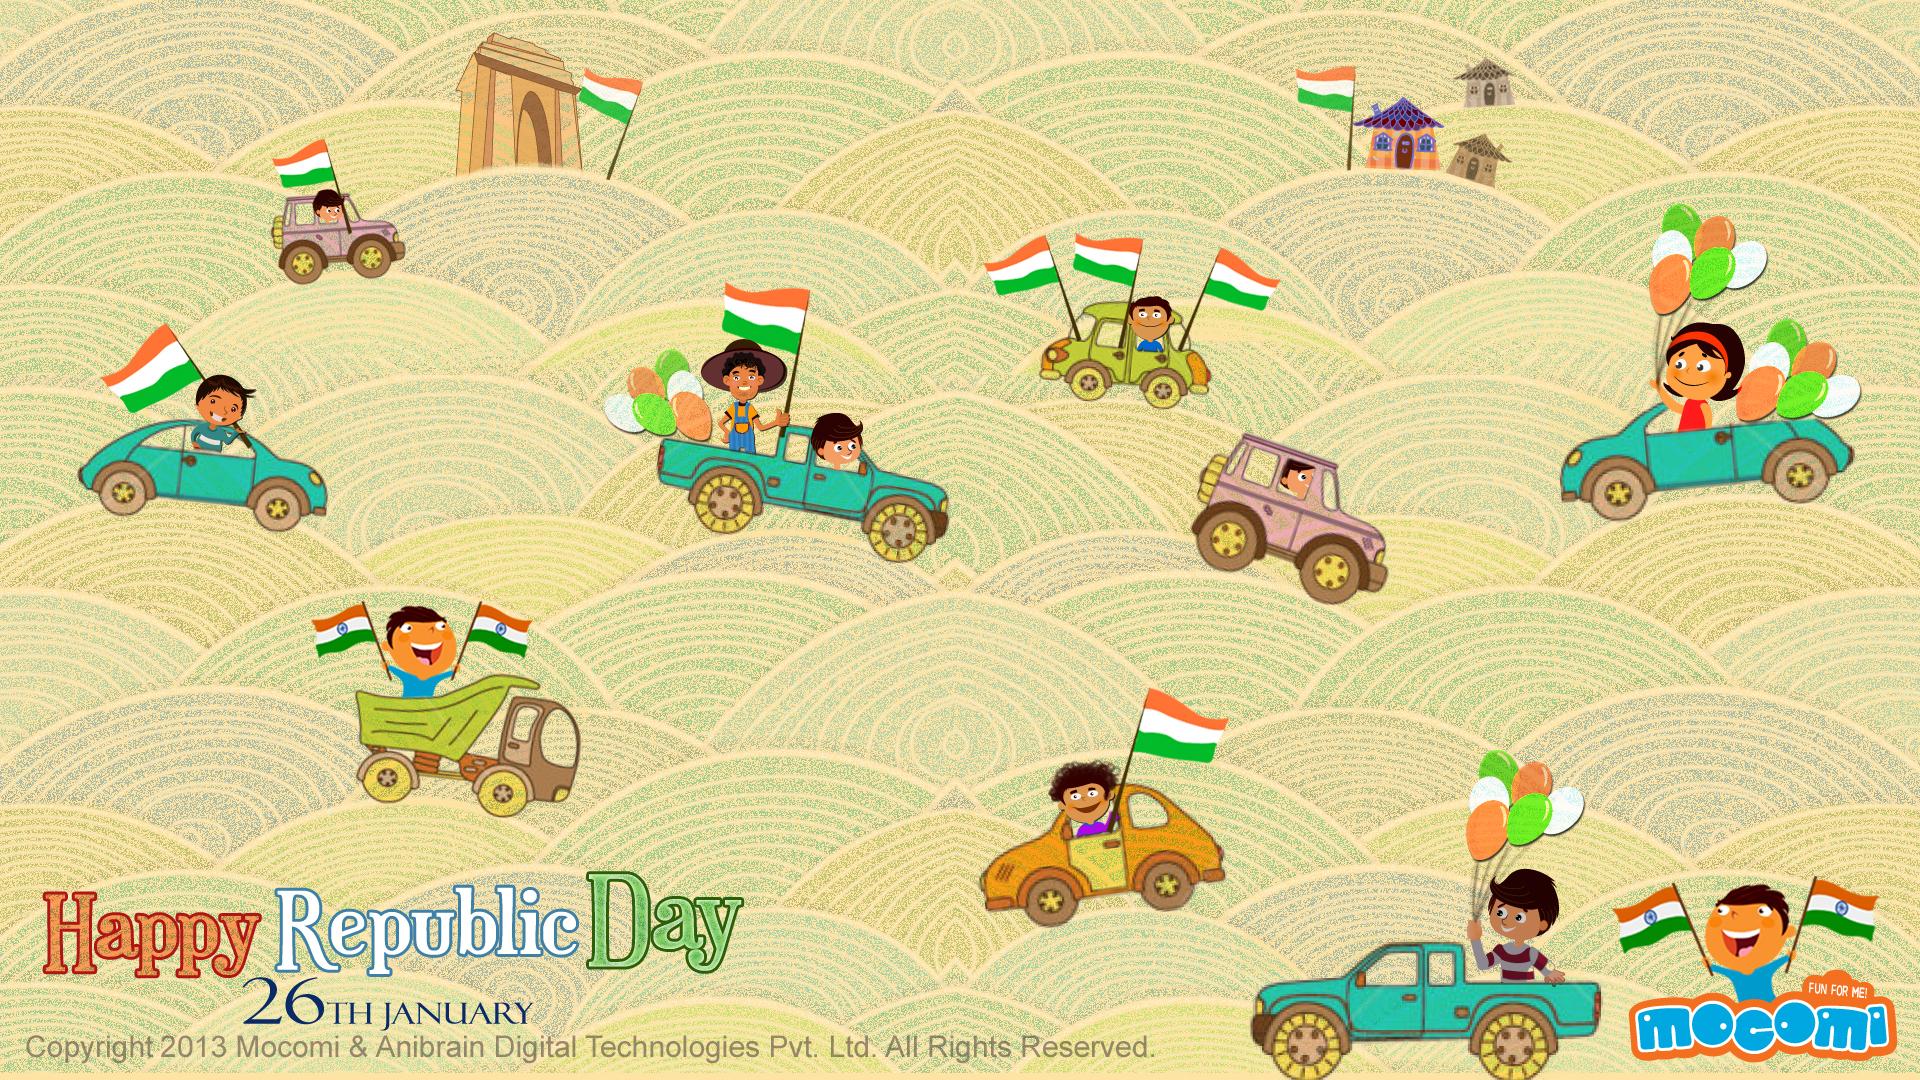 Happy Republic Day – 26th January